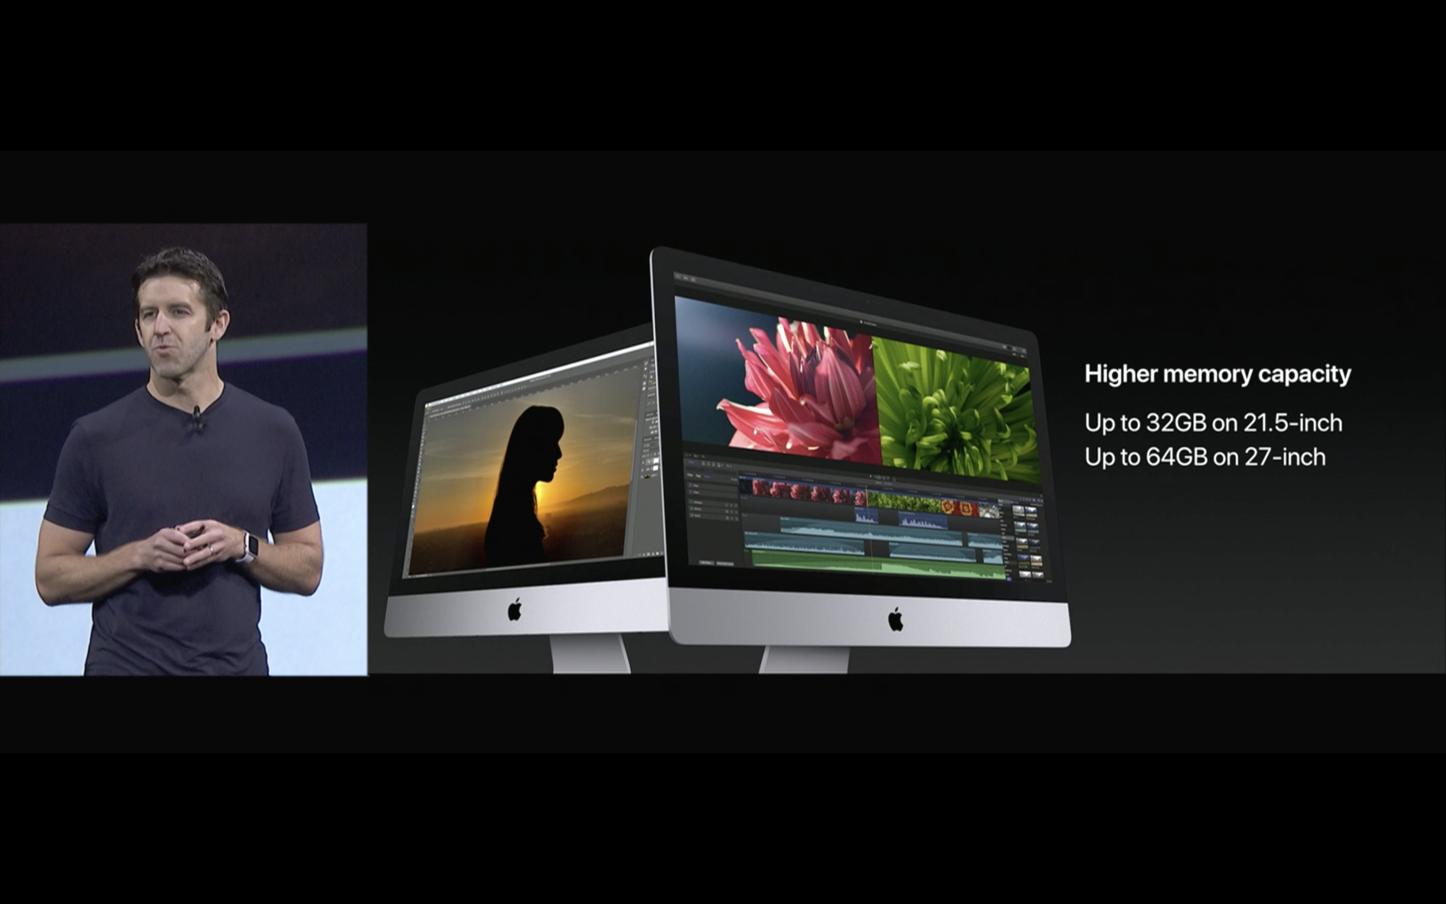 New-iMac-2017-WWDC17-07.png